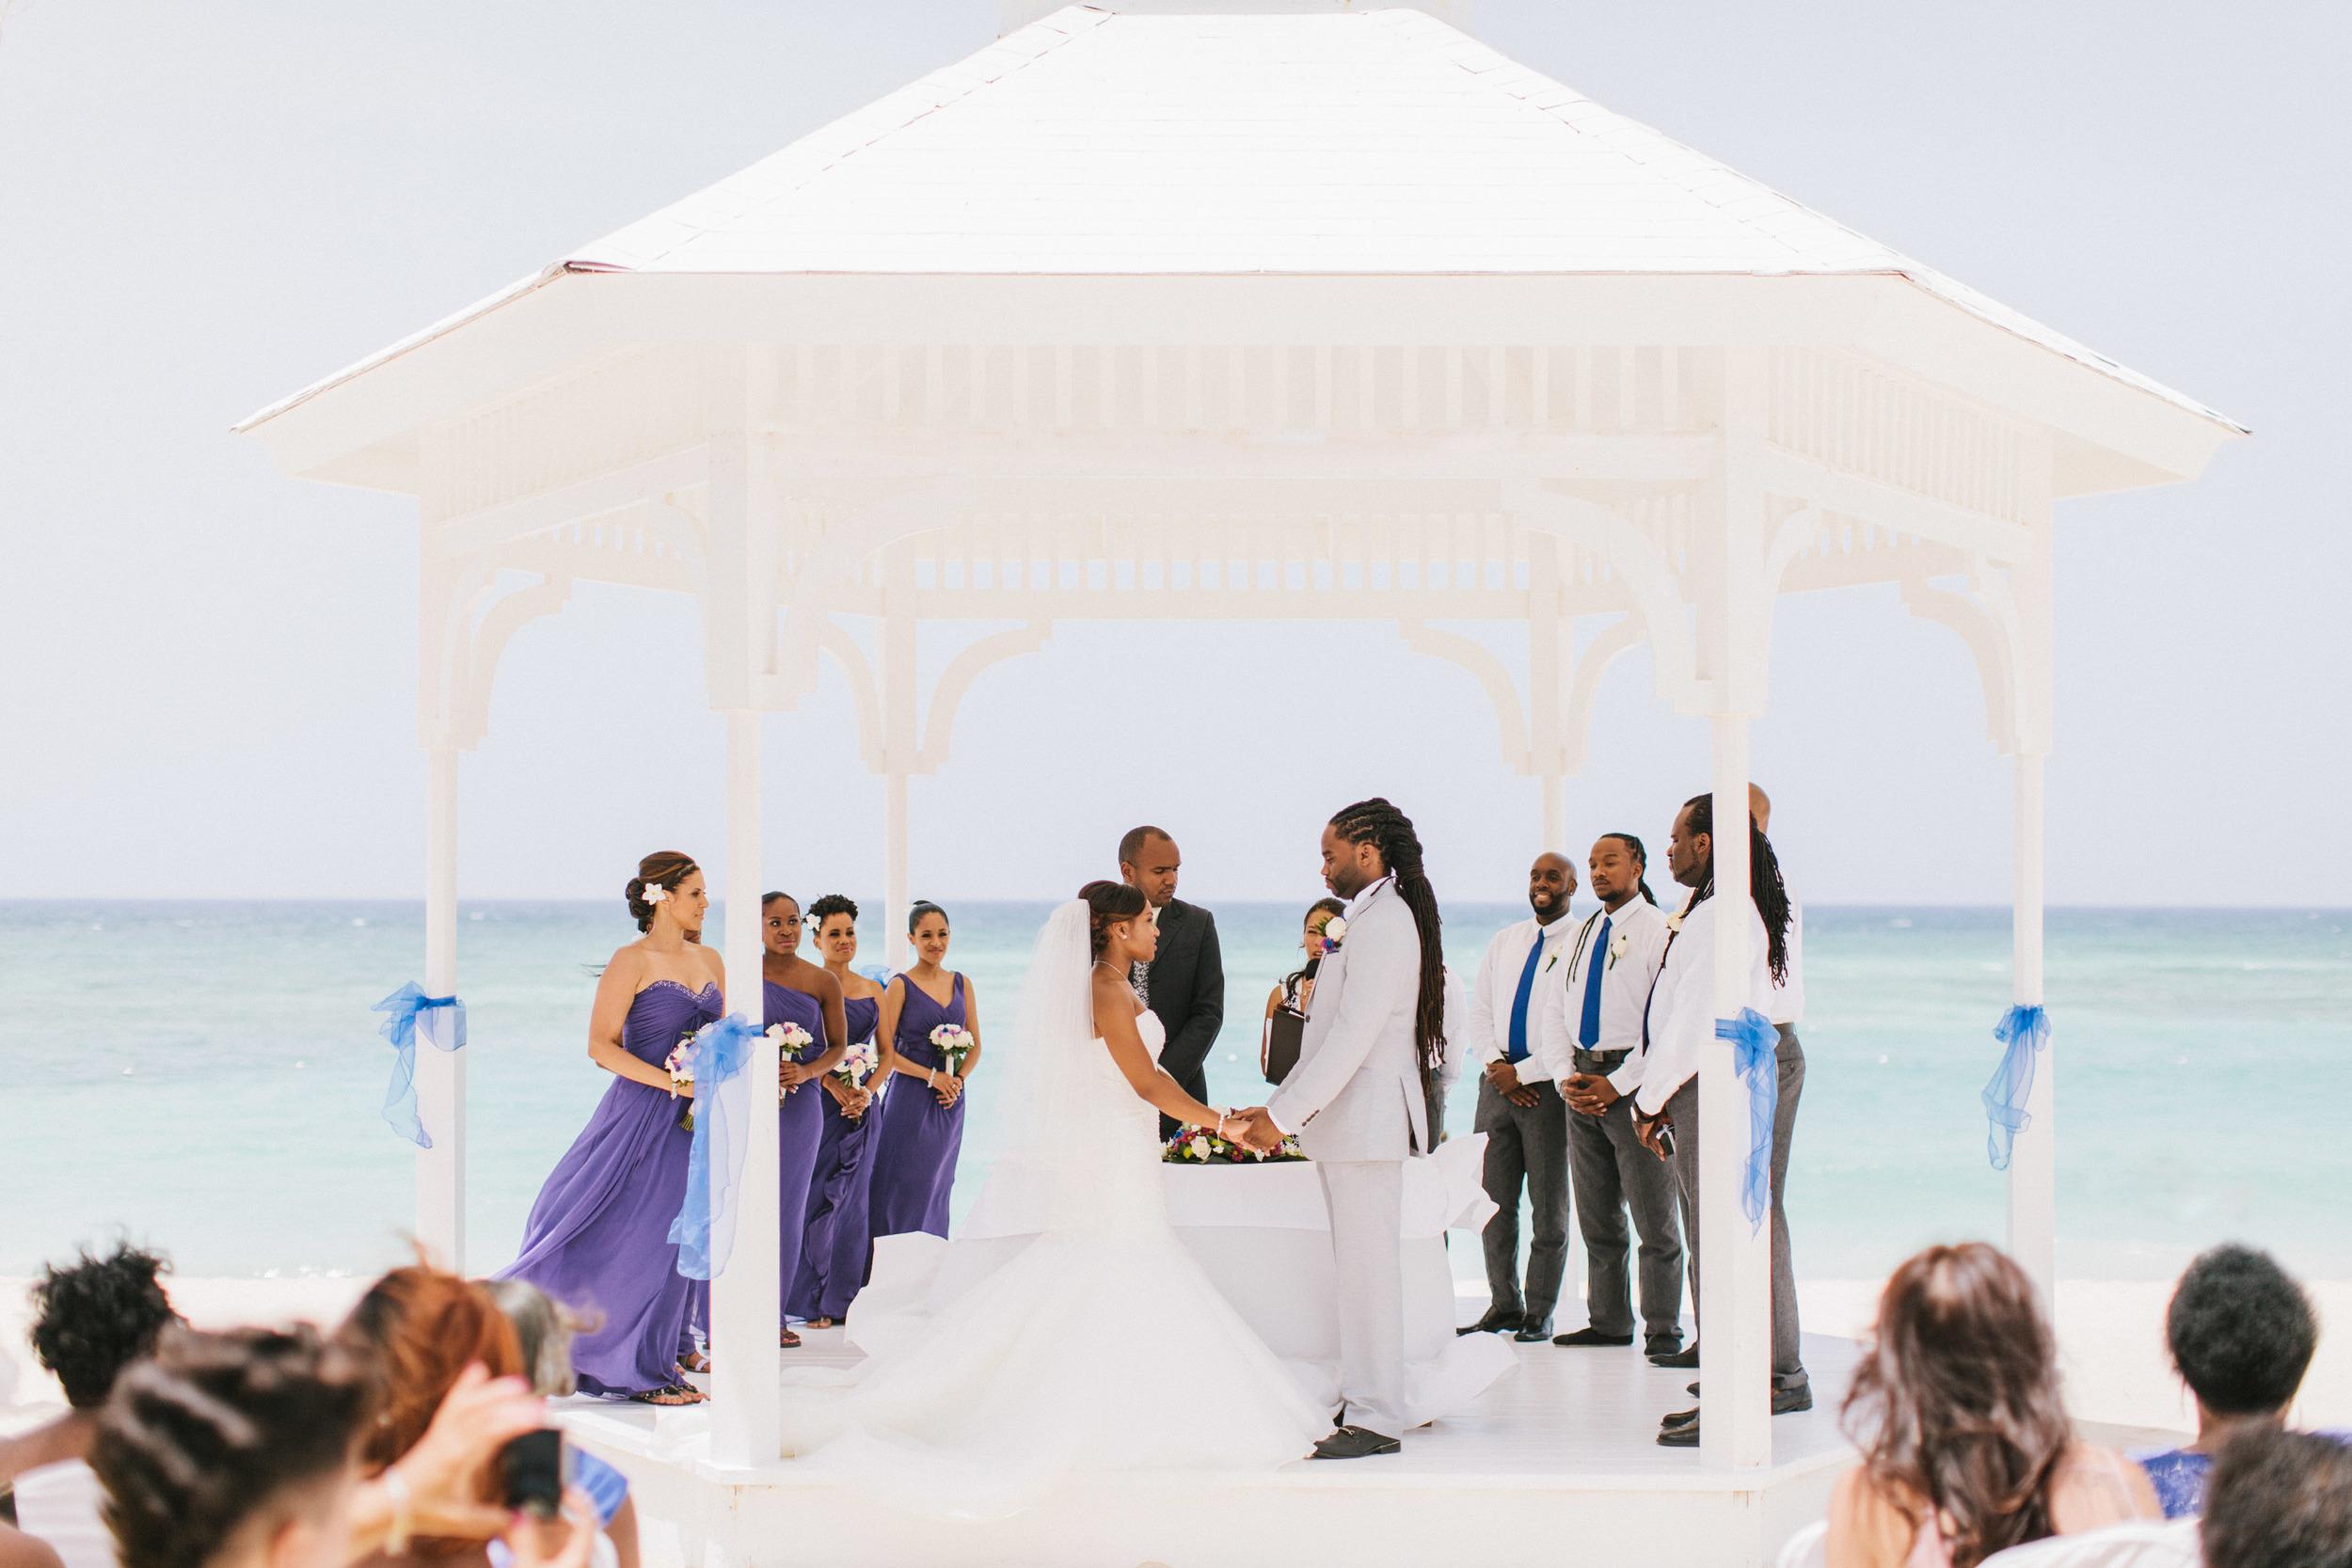 michael-rousseau-photography-dominican-republic-destination-wedding-cara-jason-colonial-majestic-dominican-republic070.jpg